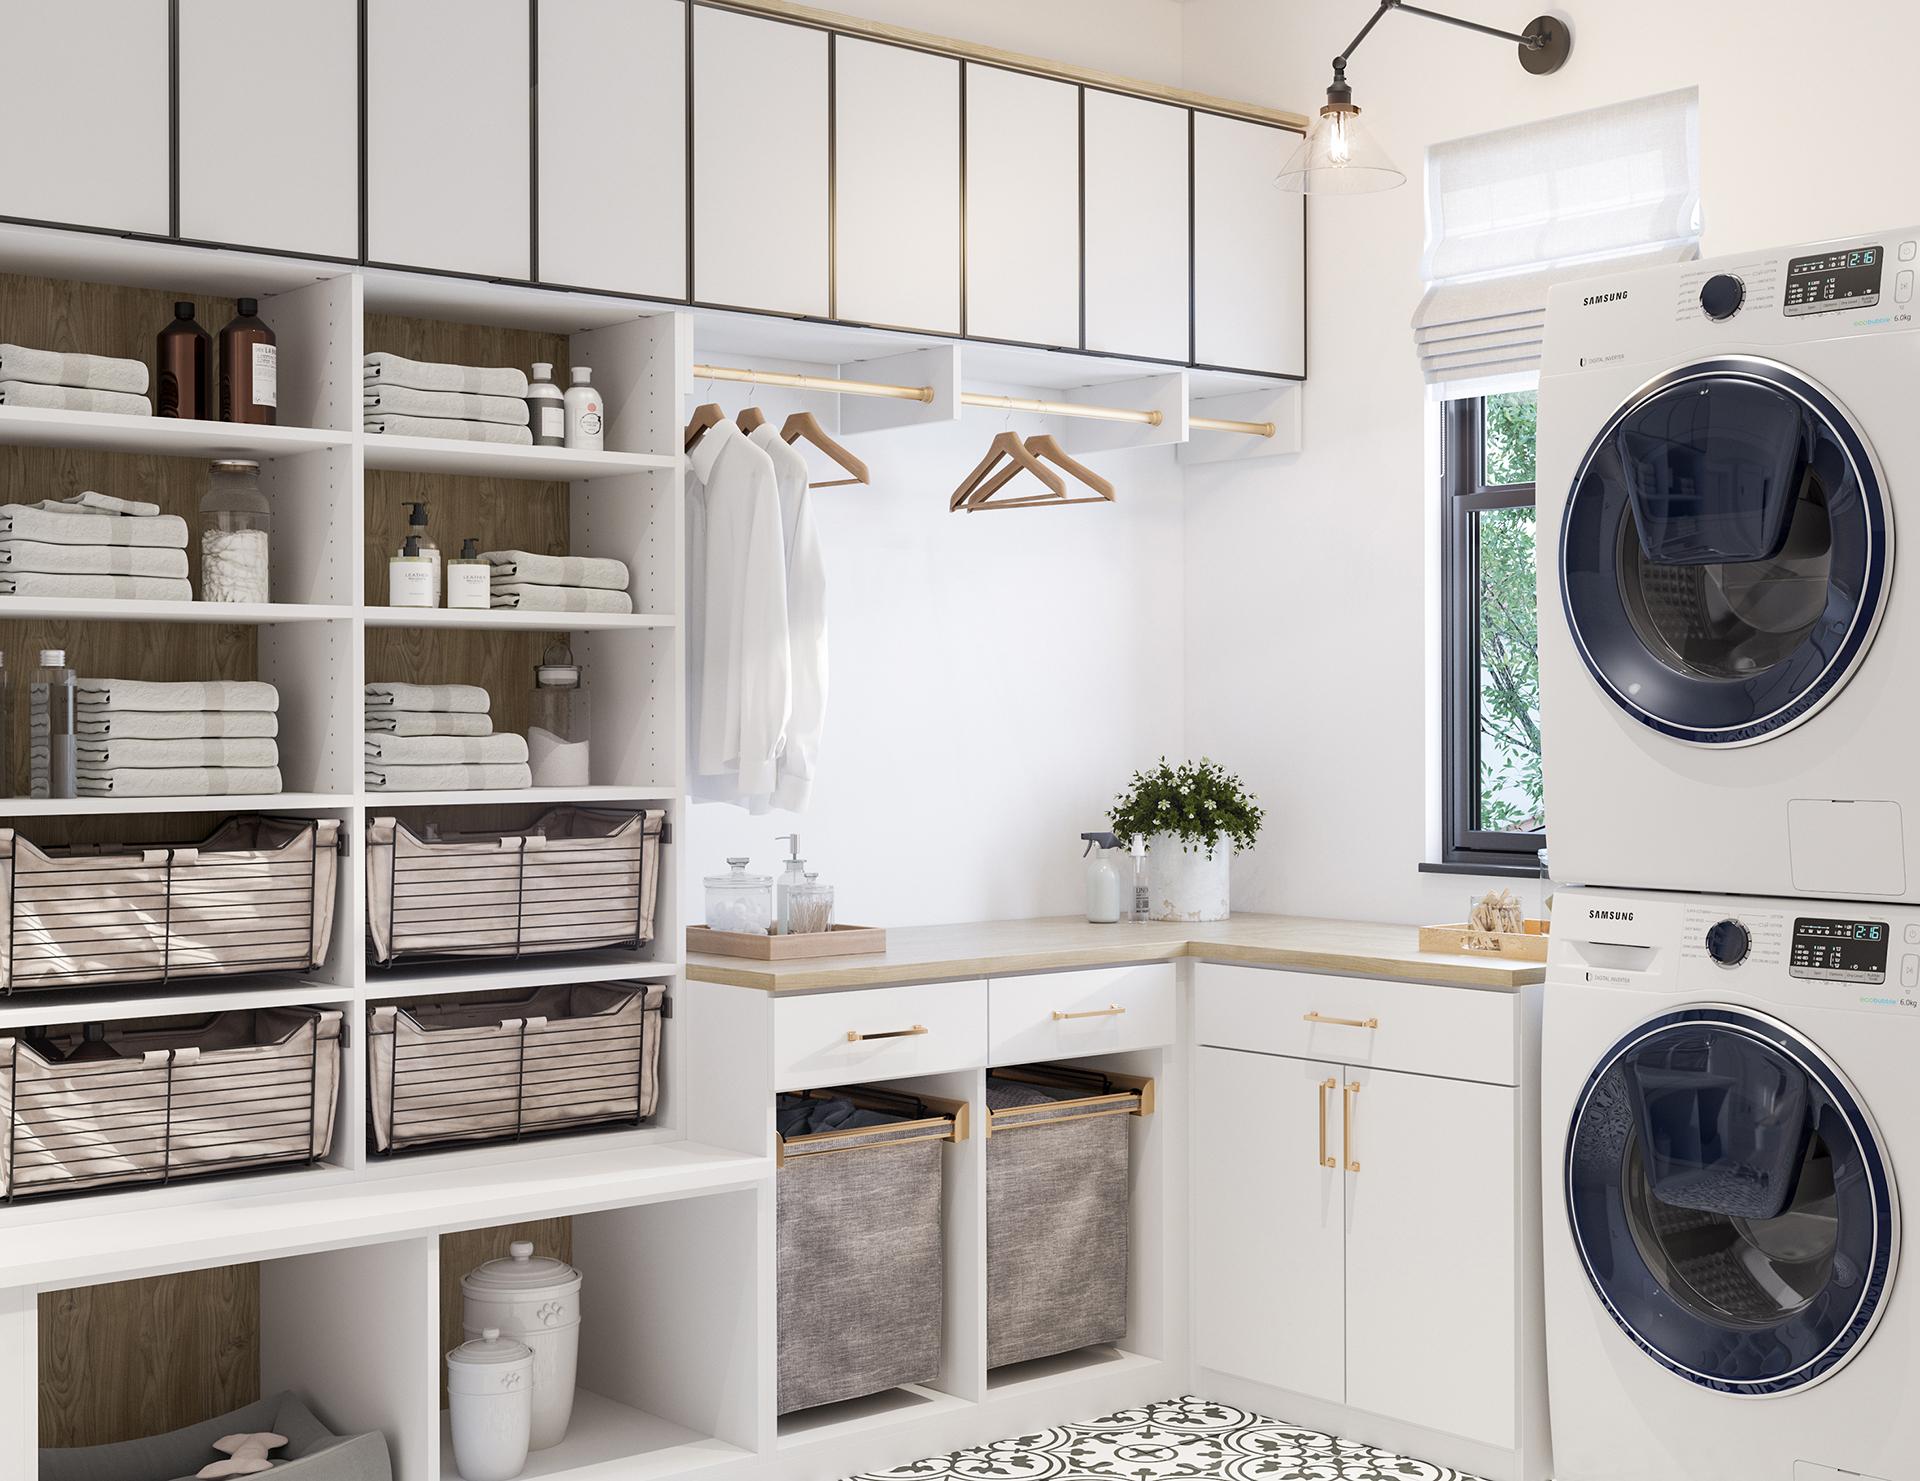 Laundry Room Cabinets & Storage Ideas | California Closets on Laundry Room Organization Ideas  id=37566